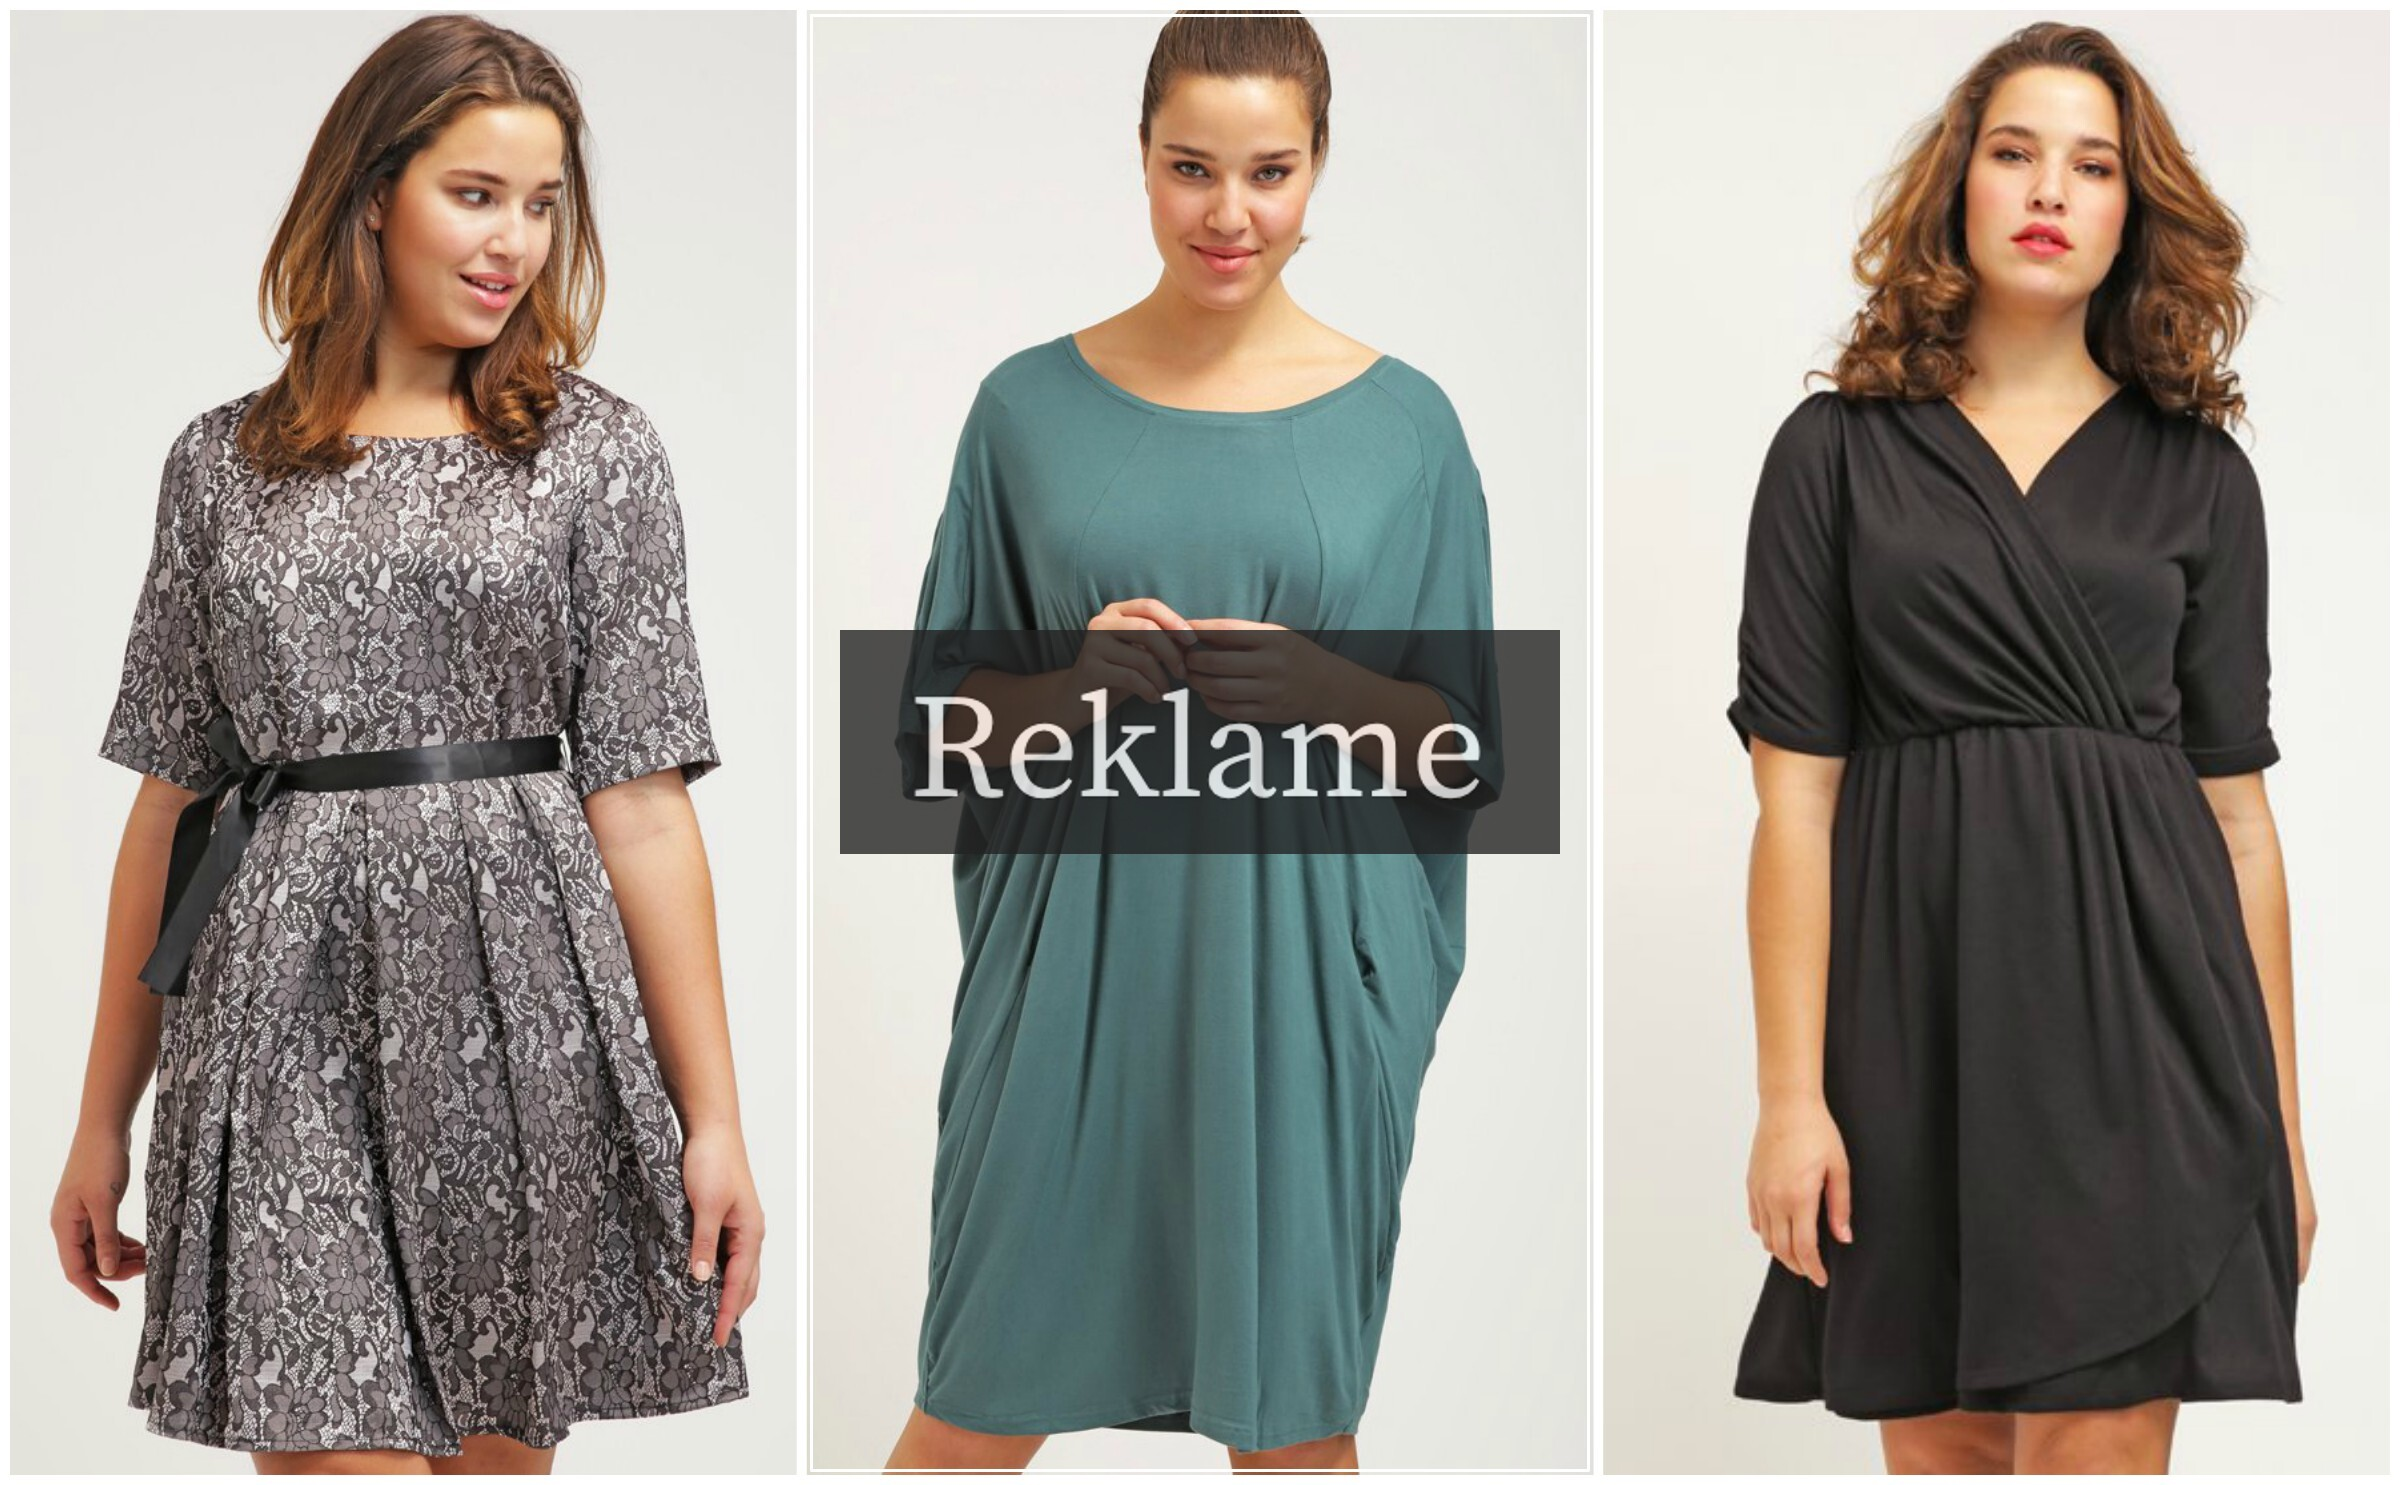 a3f81876521b Zizzi kjoler - Find dine nye Zizzi kjoler her!